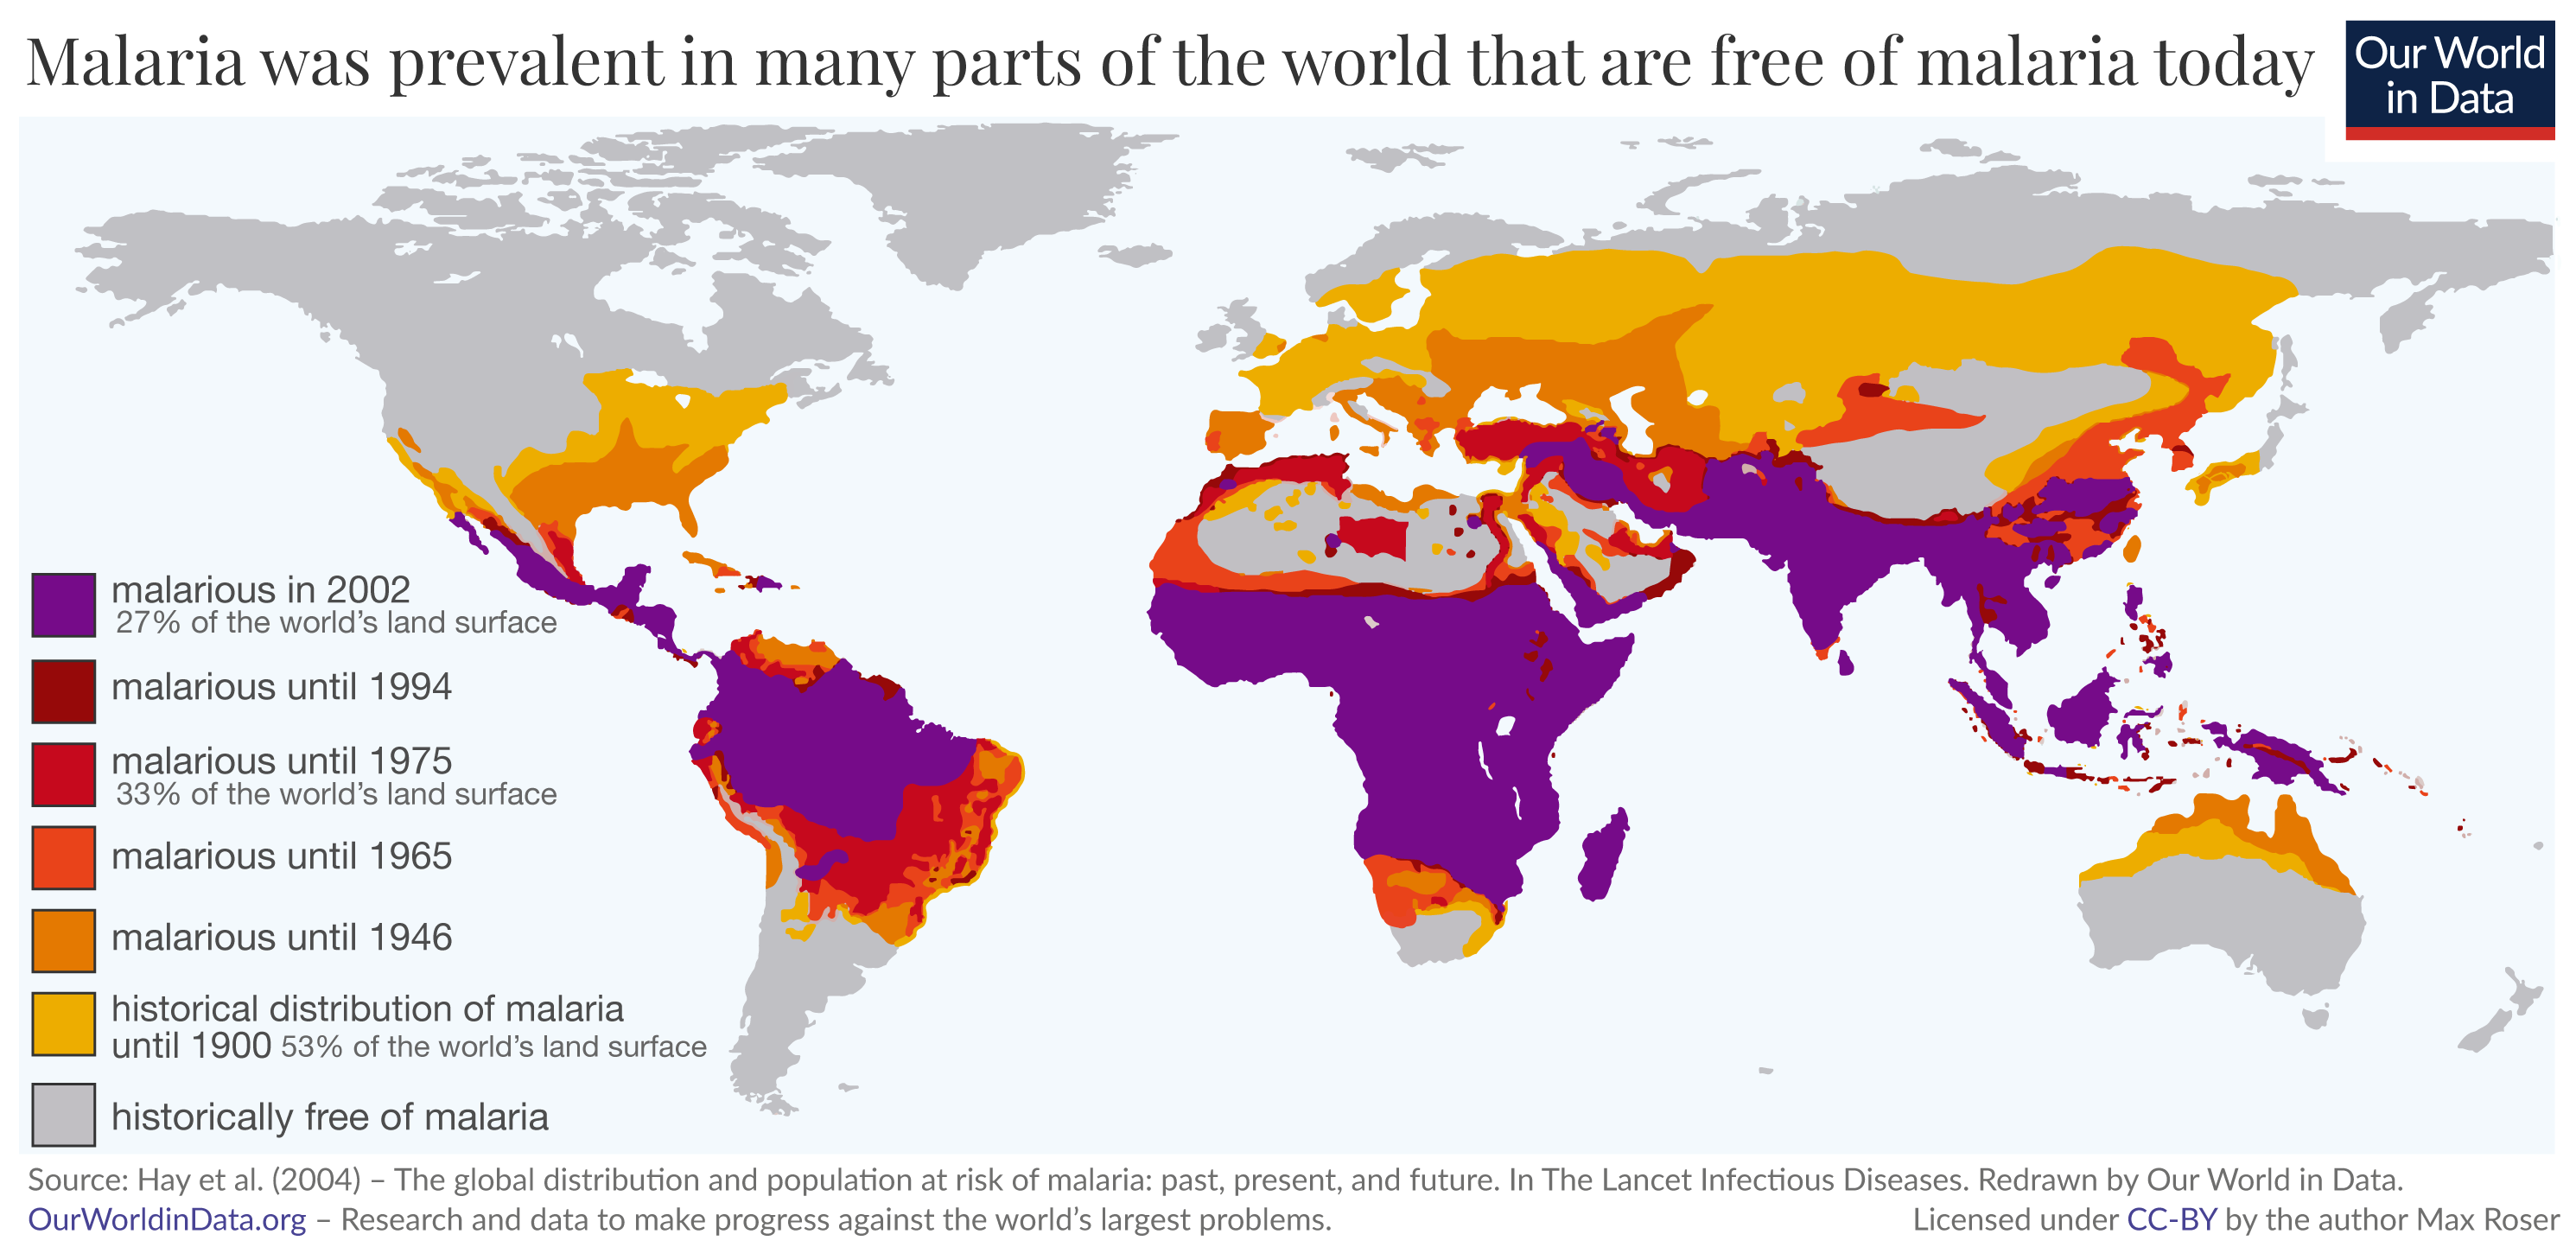 Previous prevalence of malaria world map 1